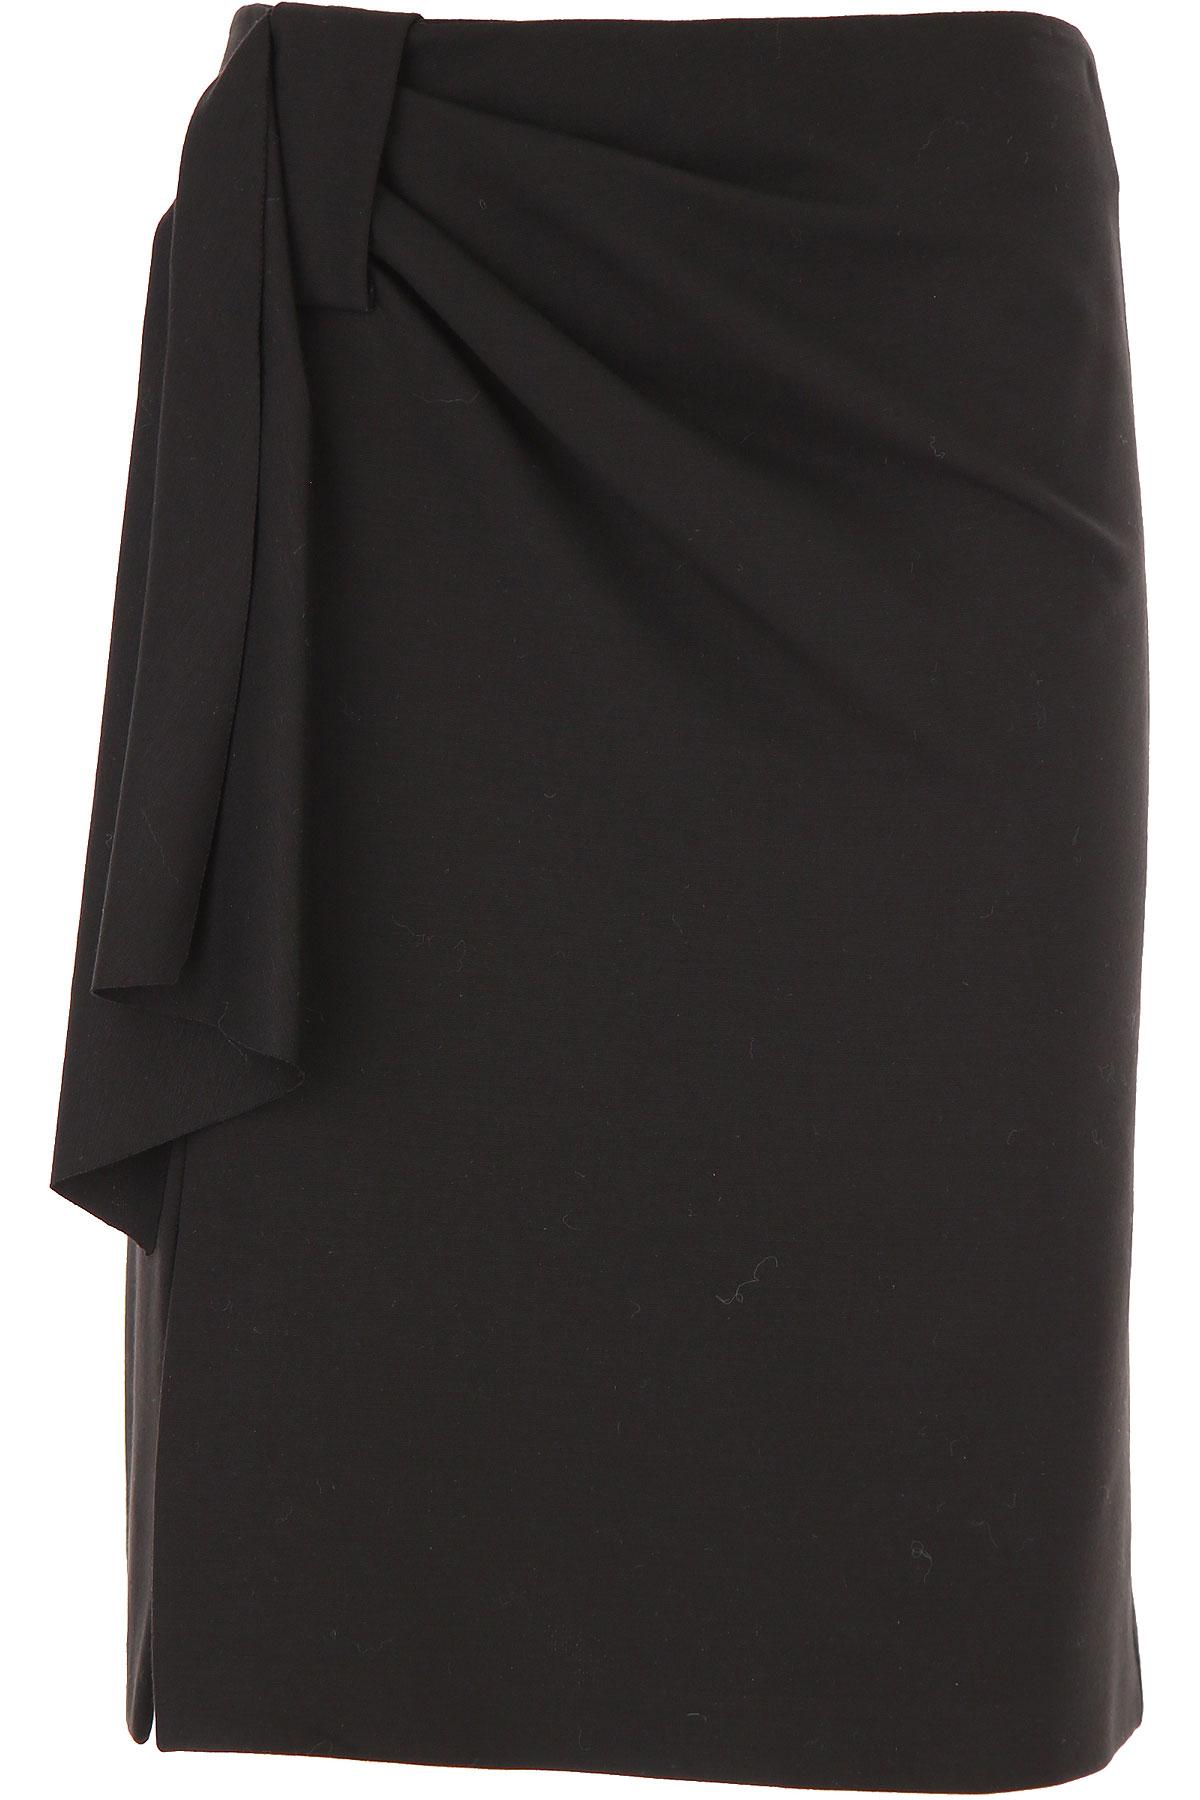 Fuzzi Skirt for Women On Sale, Black, Viscose, 2019, 4 6 8